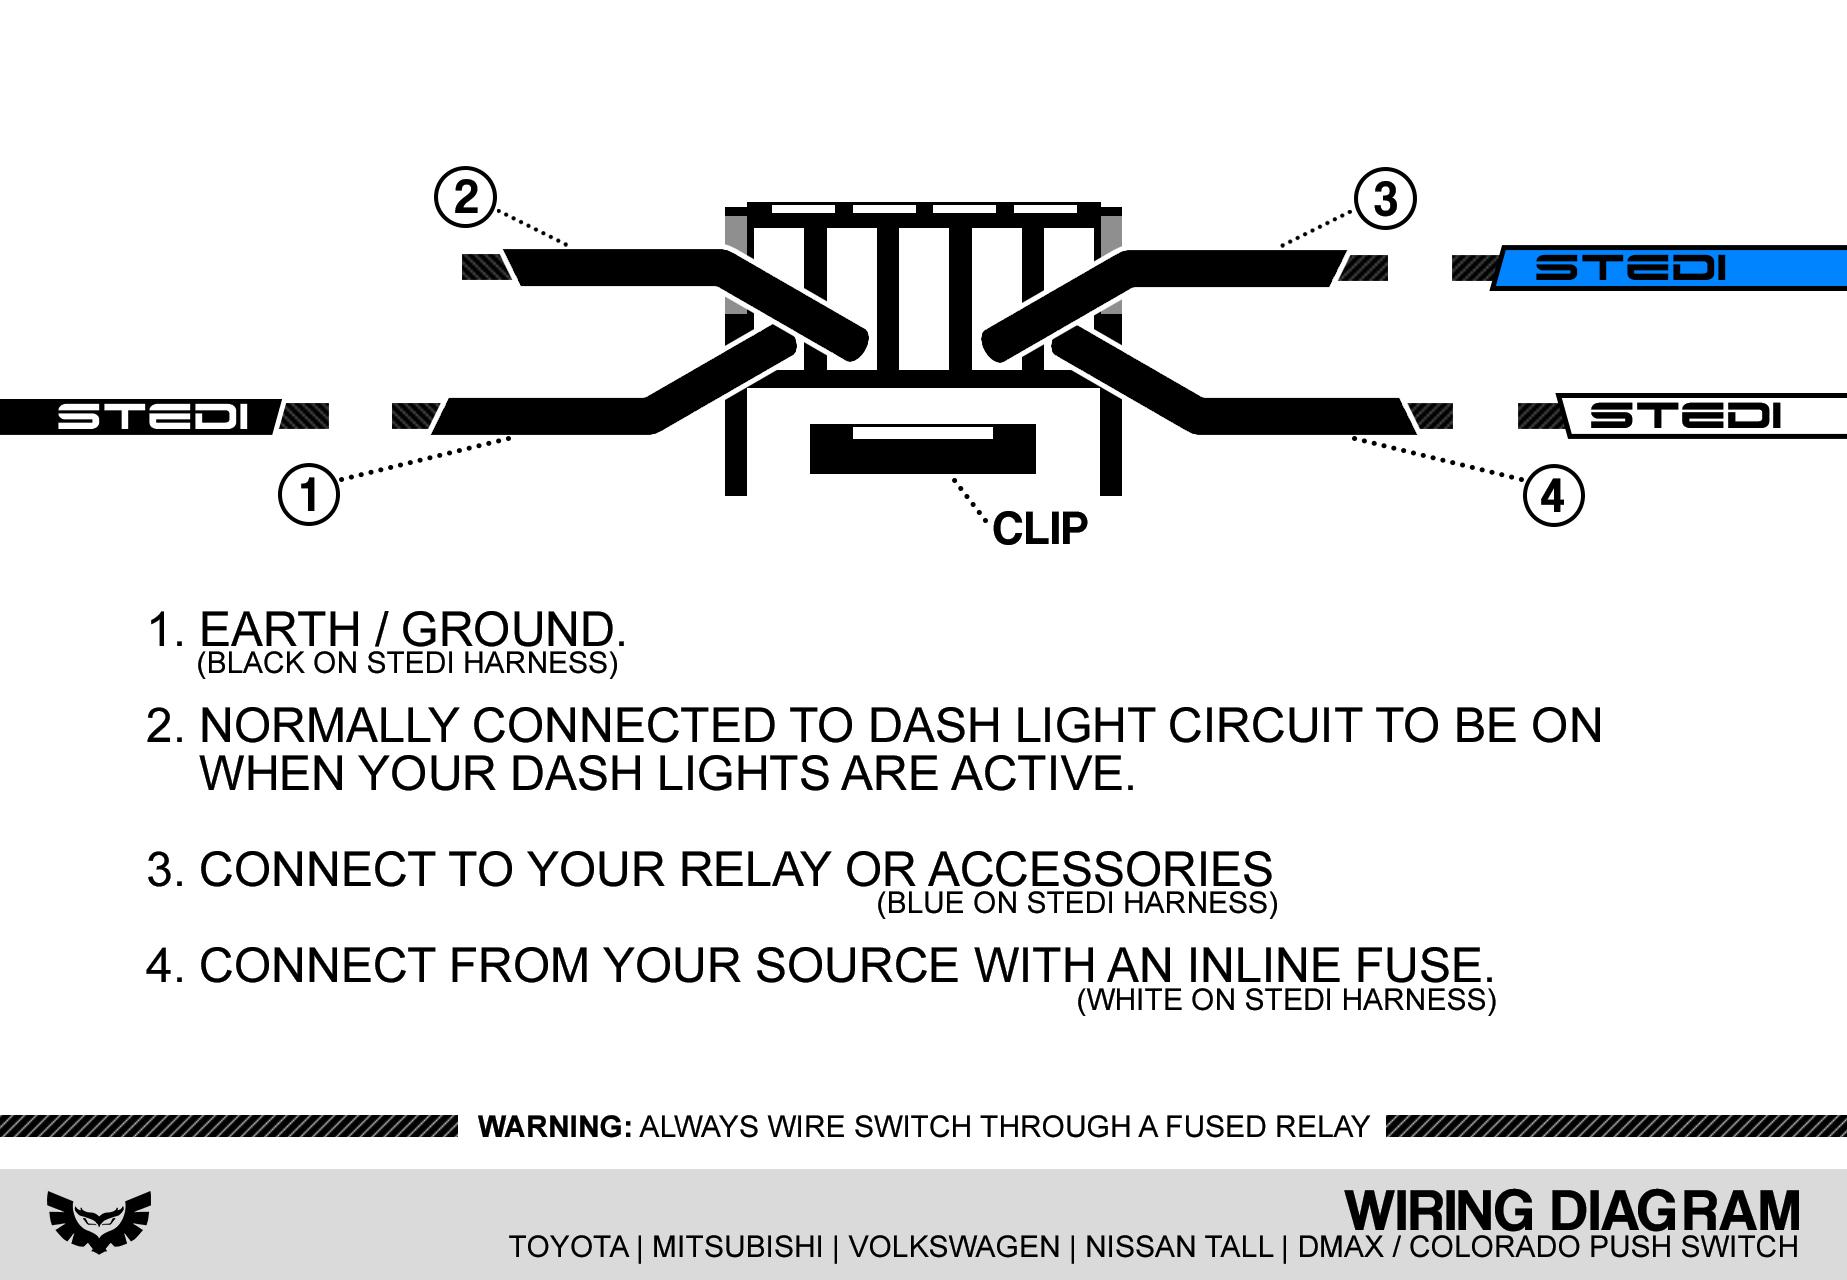 diagram] 2011 nissan altima obd ii wiring diagram full version hd quality wiring  diagram - boatdiagrams.digitalight.it  digit